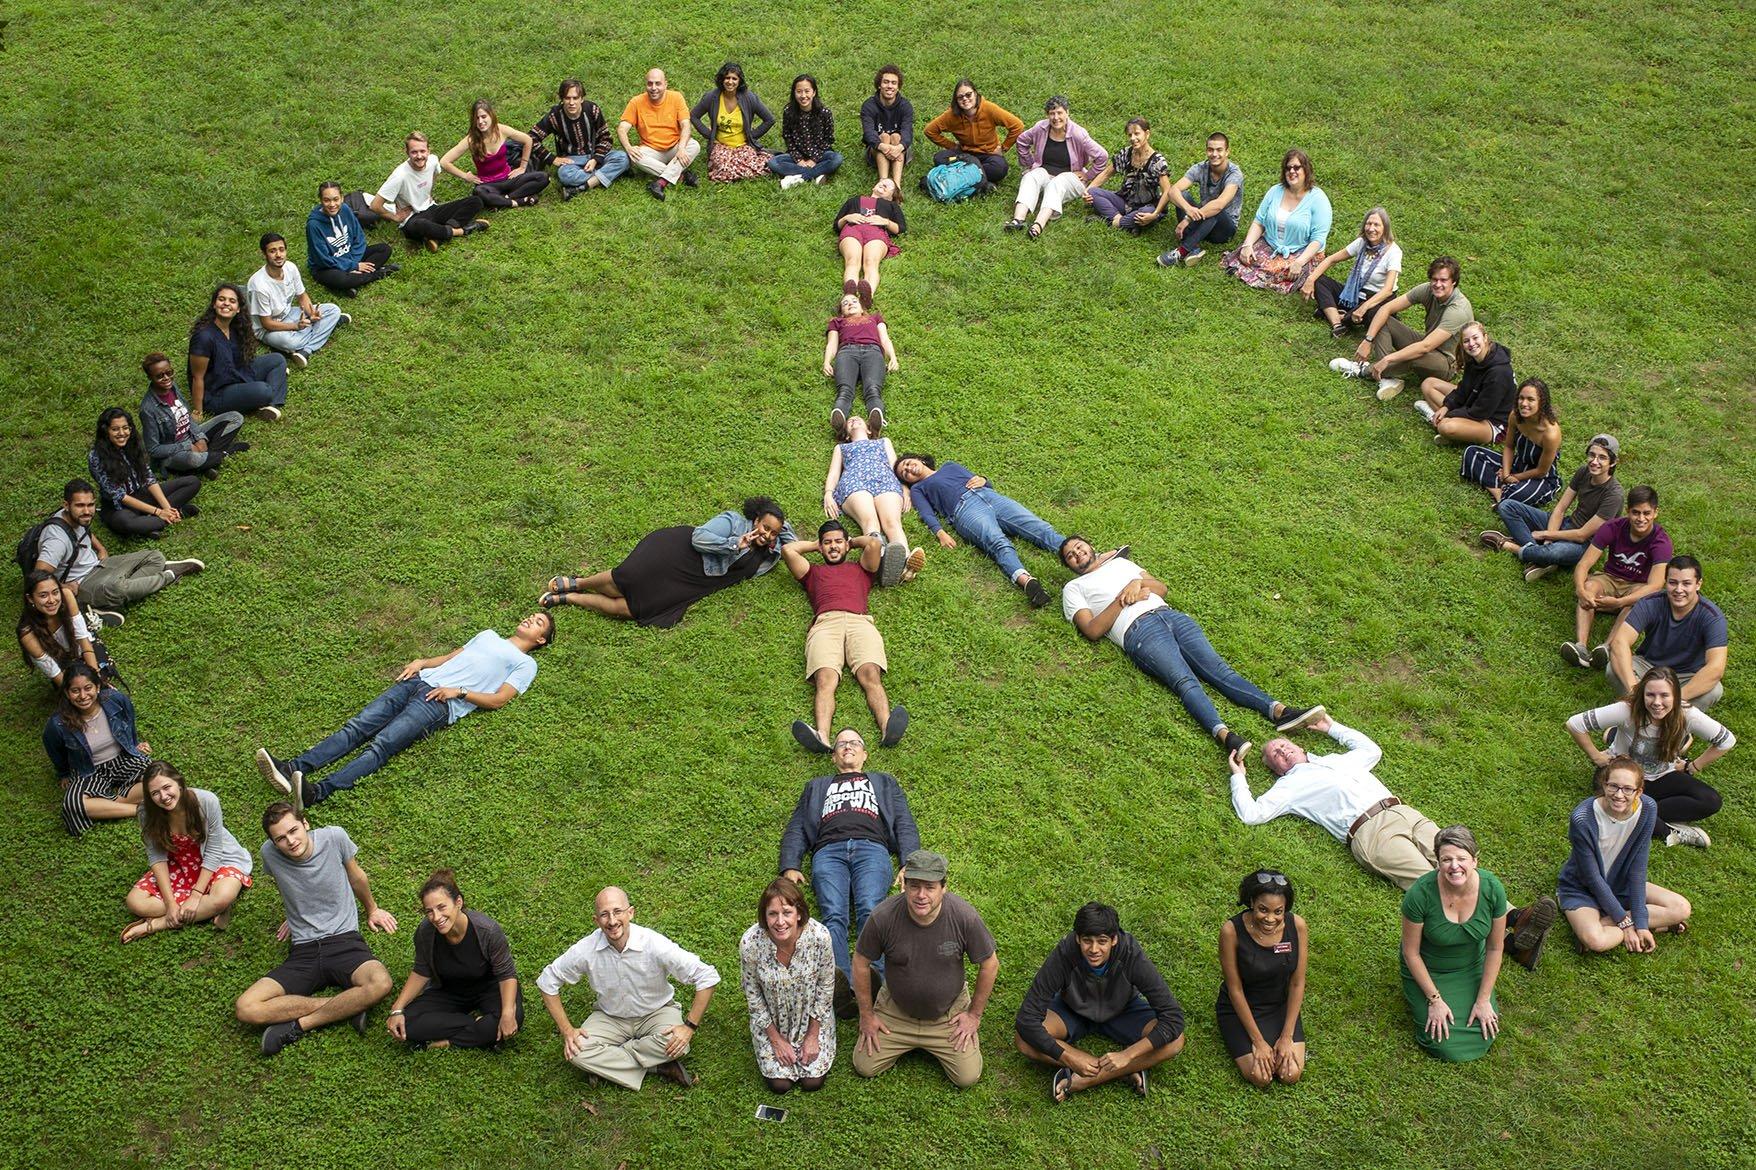 peace conflict studies swarthmore